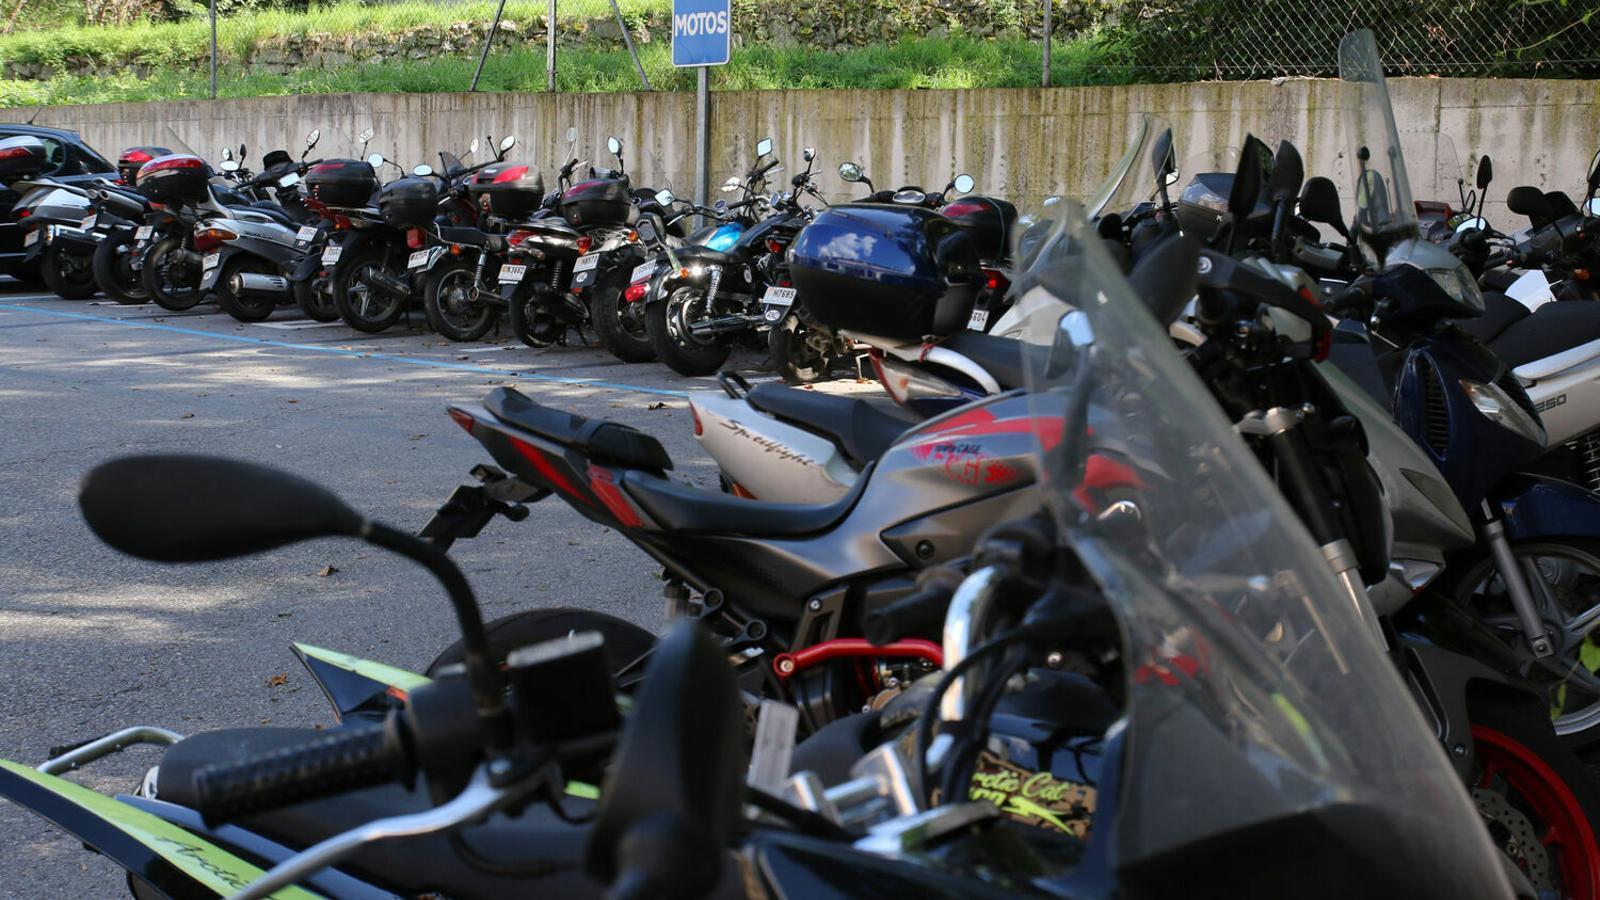 Motocicletes estacionades en un aparcament. / ARXIU ANA